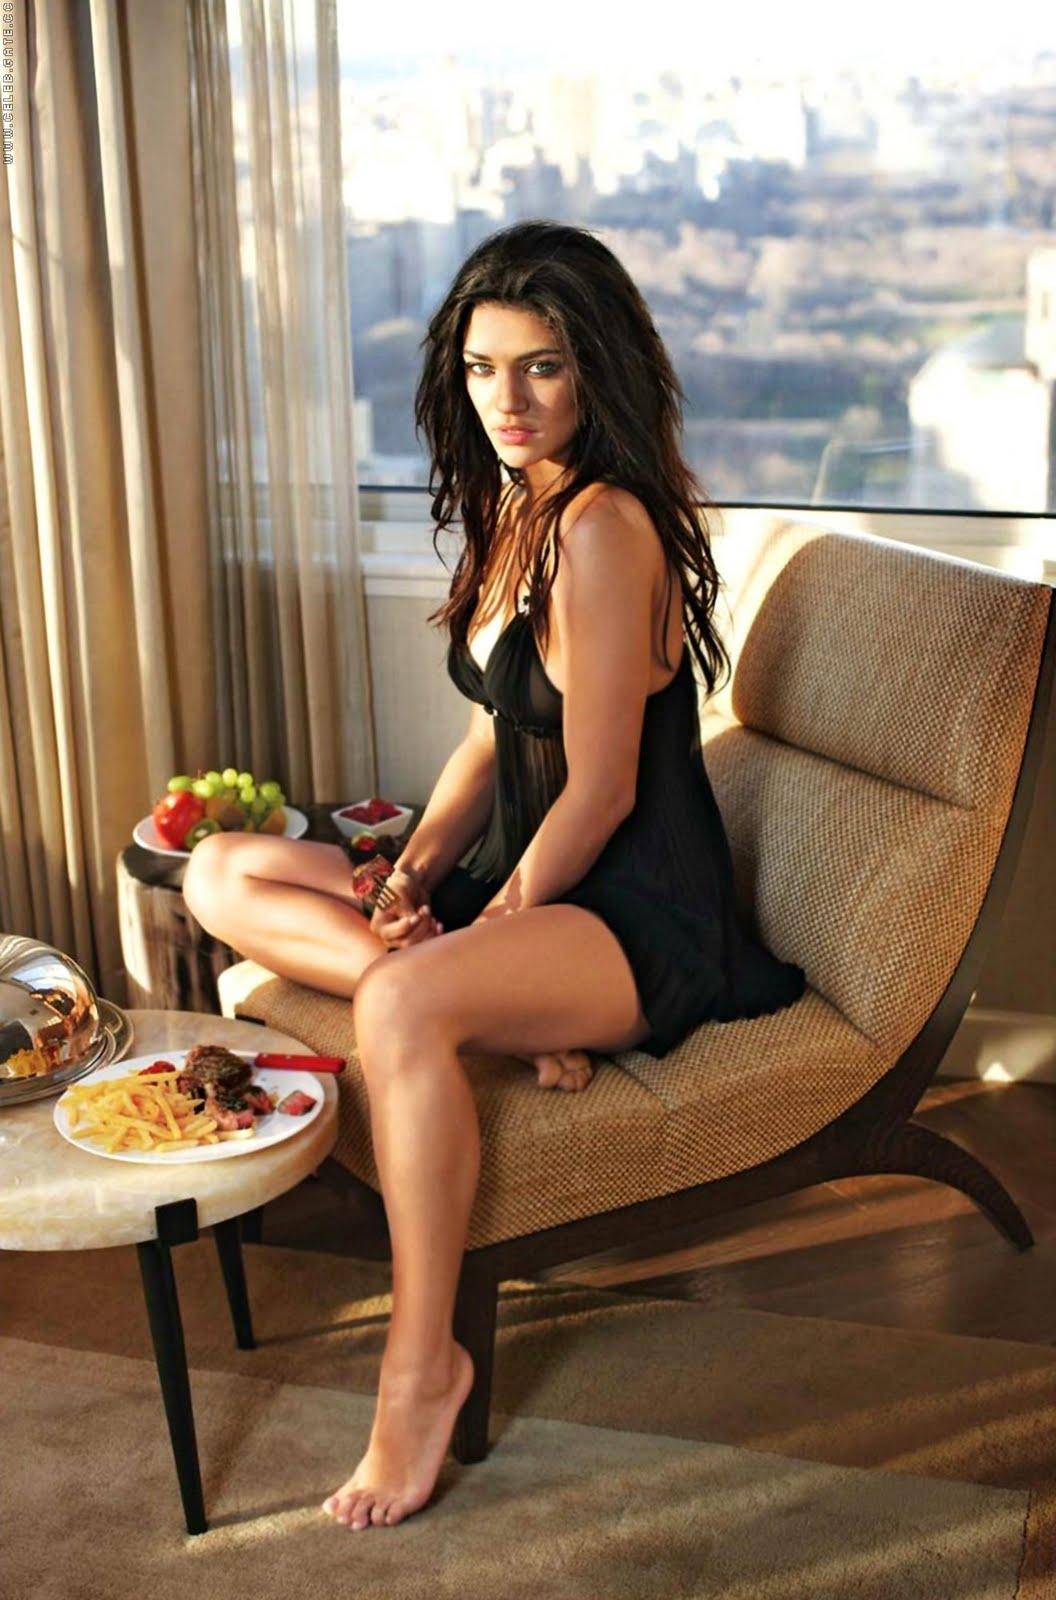 http://3.bp.blogspot.com/_ZiJoh4kW_FI/S7dUCyb-esI/AAAAAAAAAXE/8ttbqVziyWk/s1600/JessicaSzohr006.jpeg